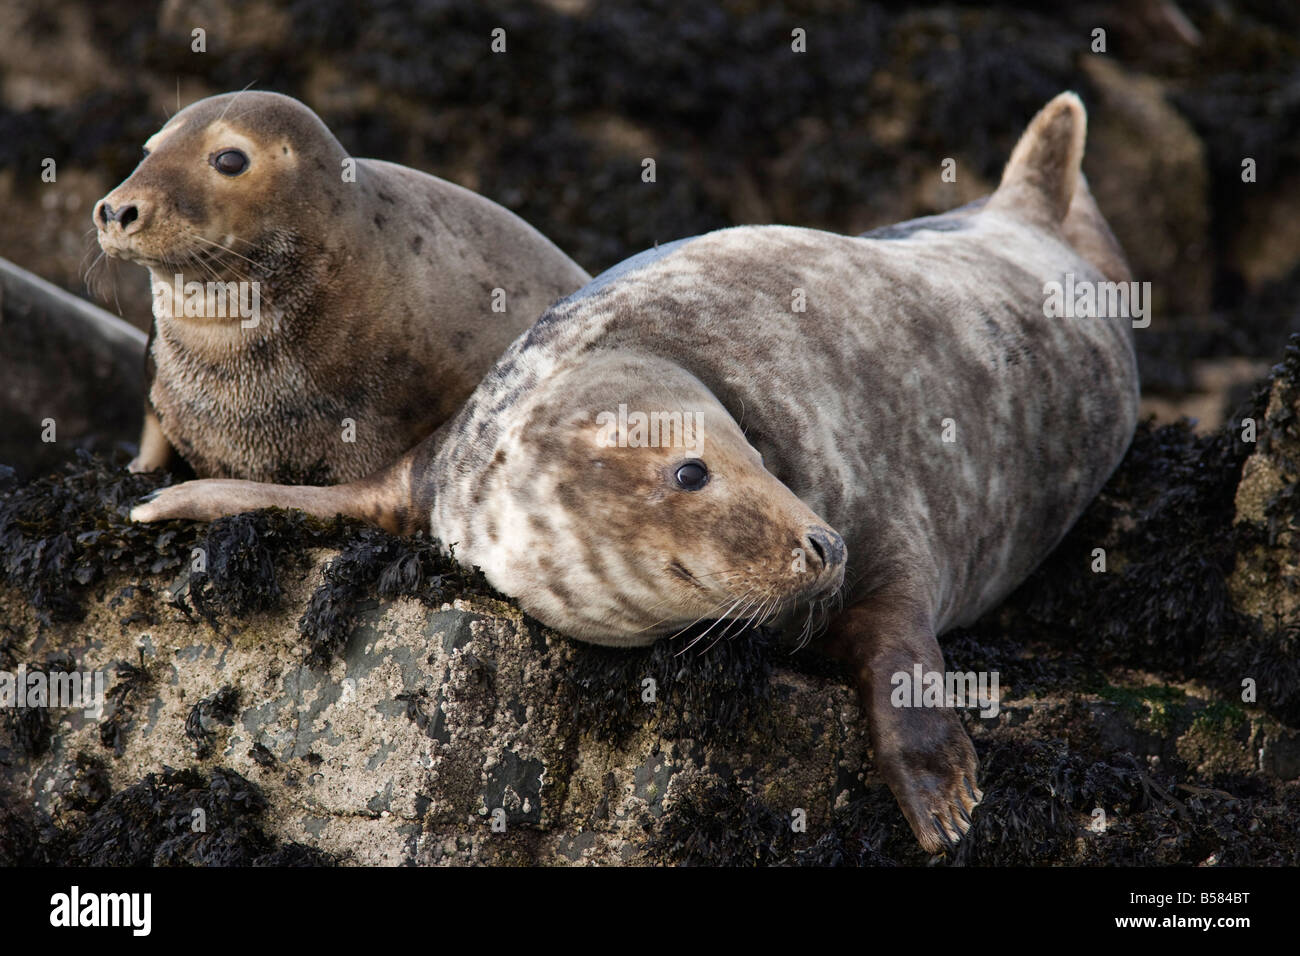 Grey seals (Halichoerus grypus), Farne Islands, Seahouses, Northumberland, England, United Kingdom, Europe - Stock Image